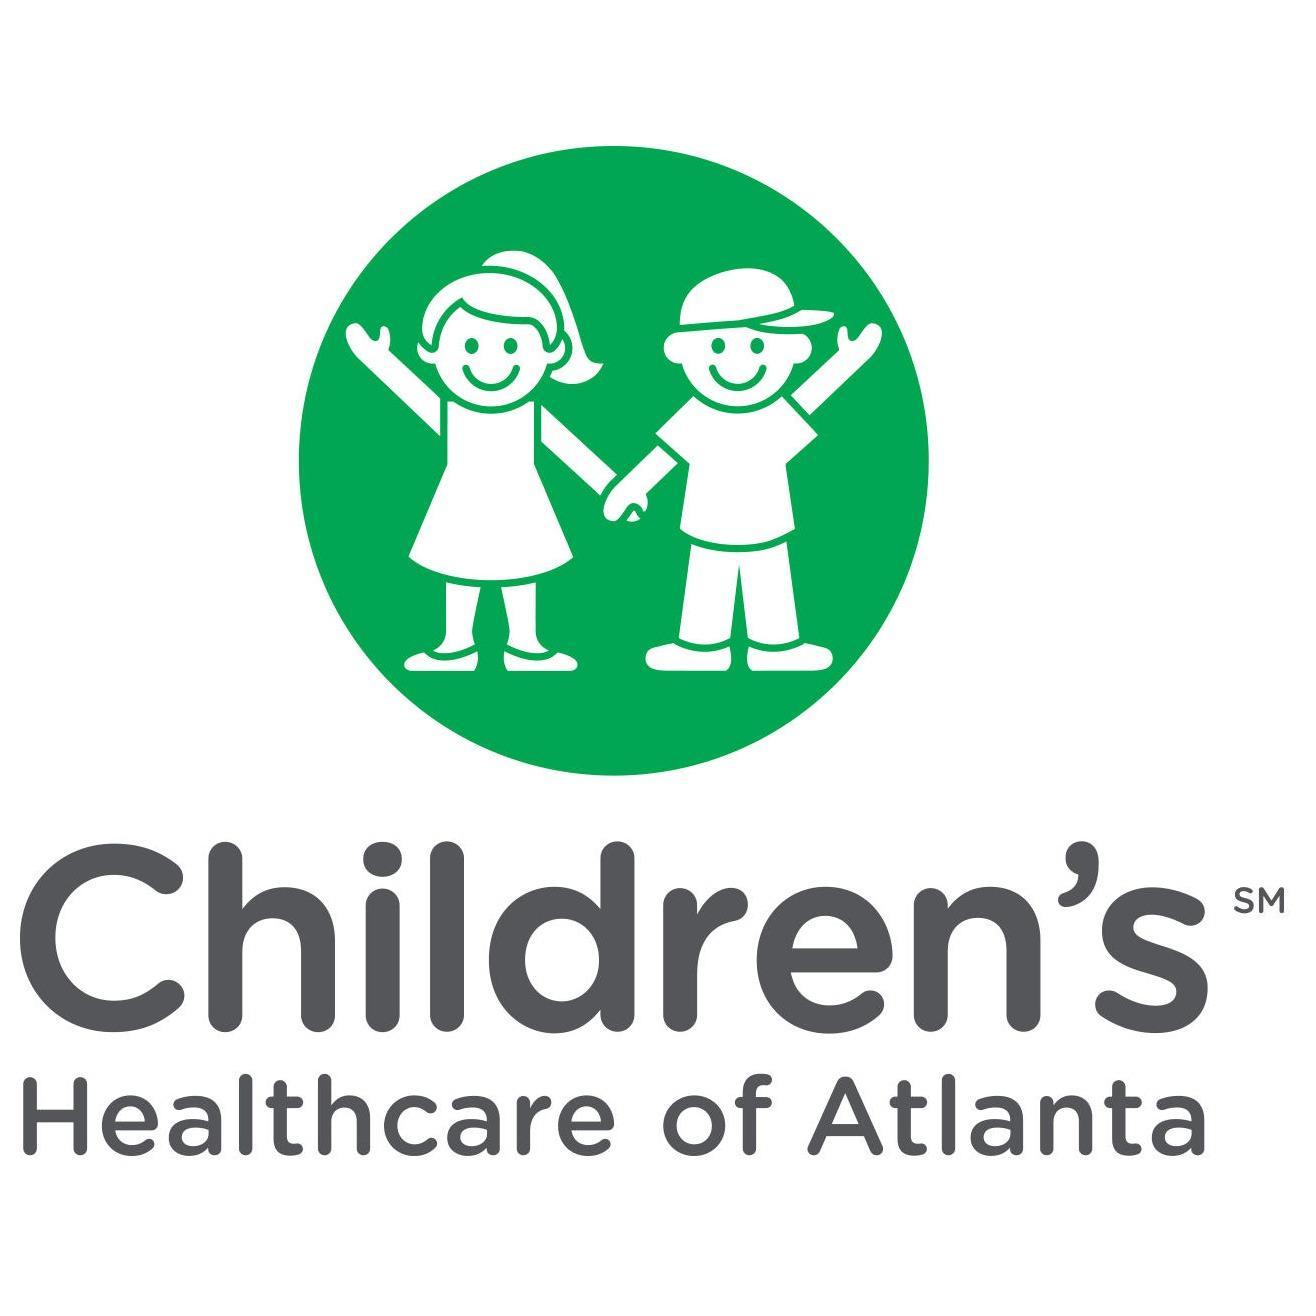 Children's Healthcare of Atlanta Primary Care Center - Chamblee